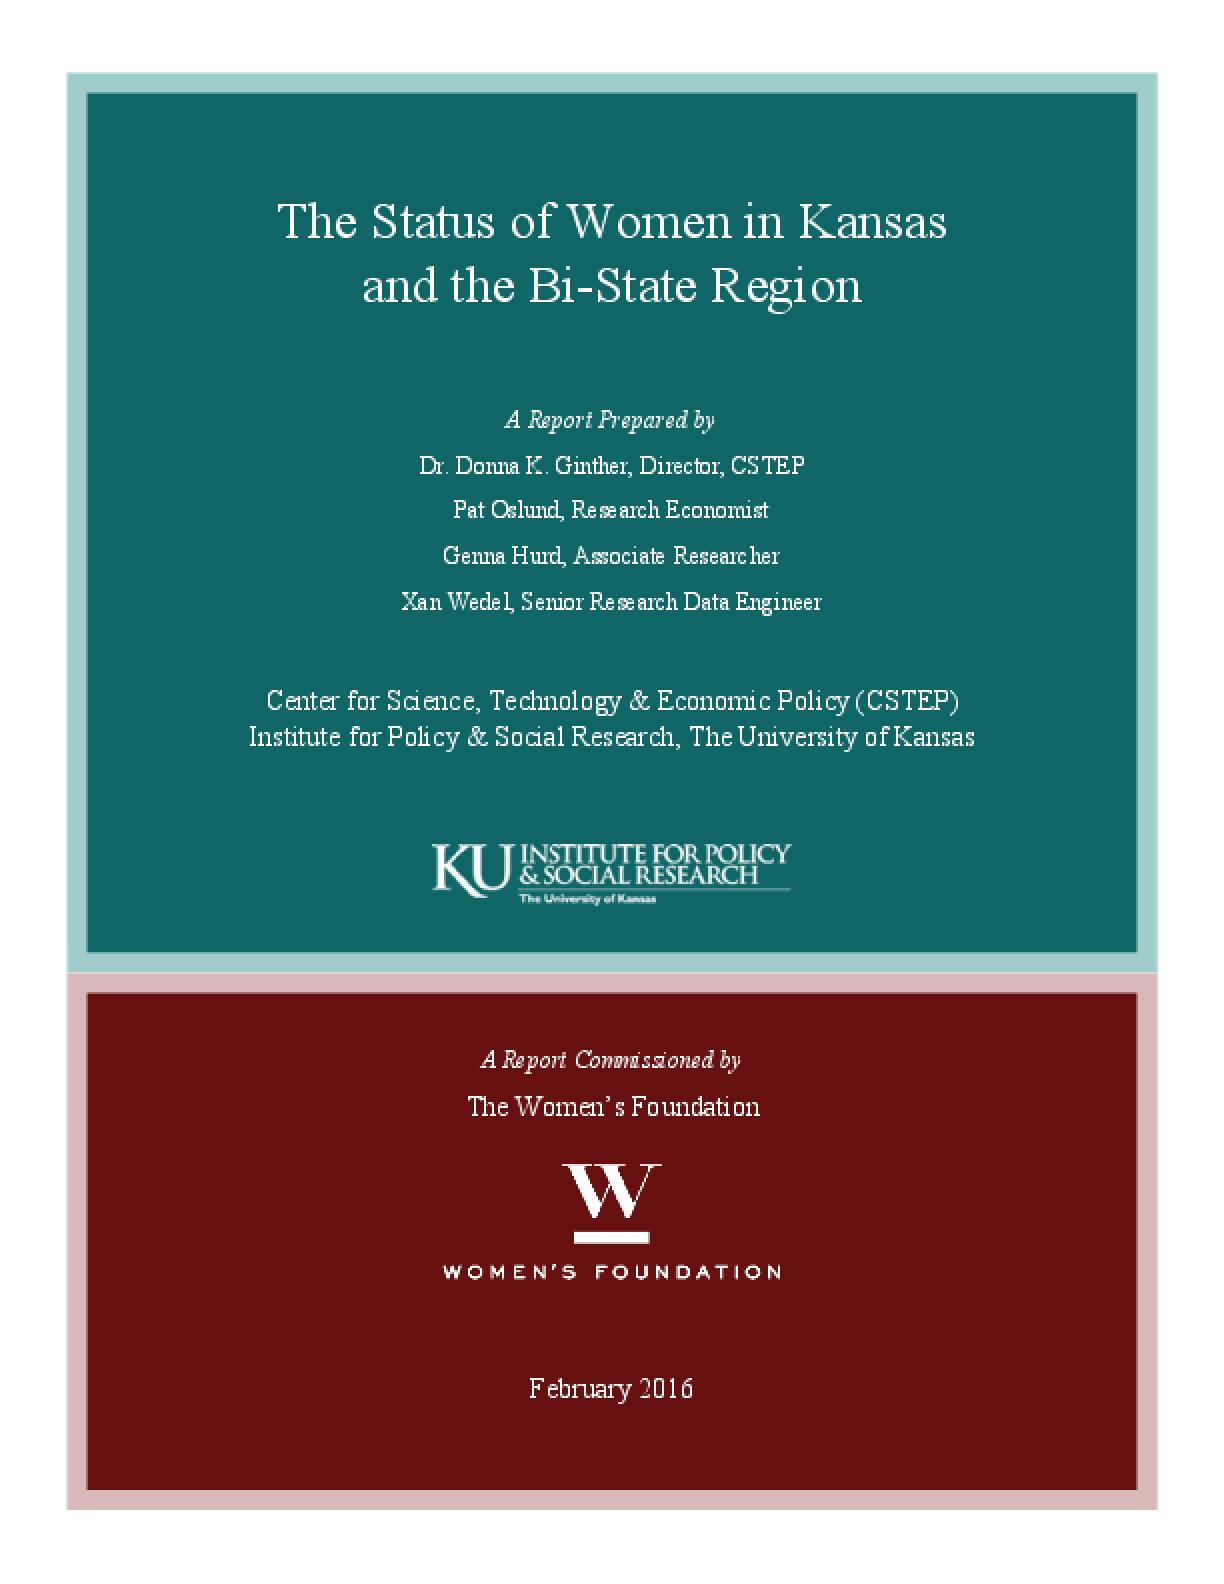 The Status of Women in Kansas and the Bi-State Region